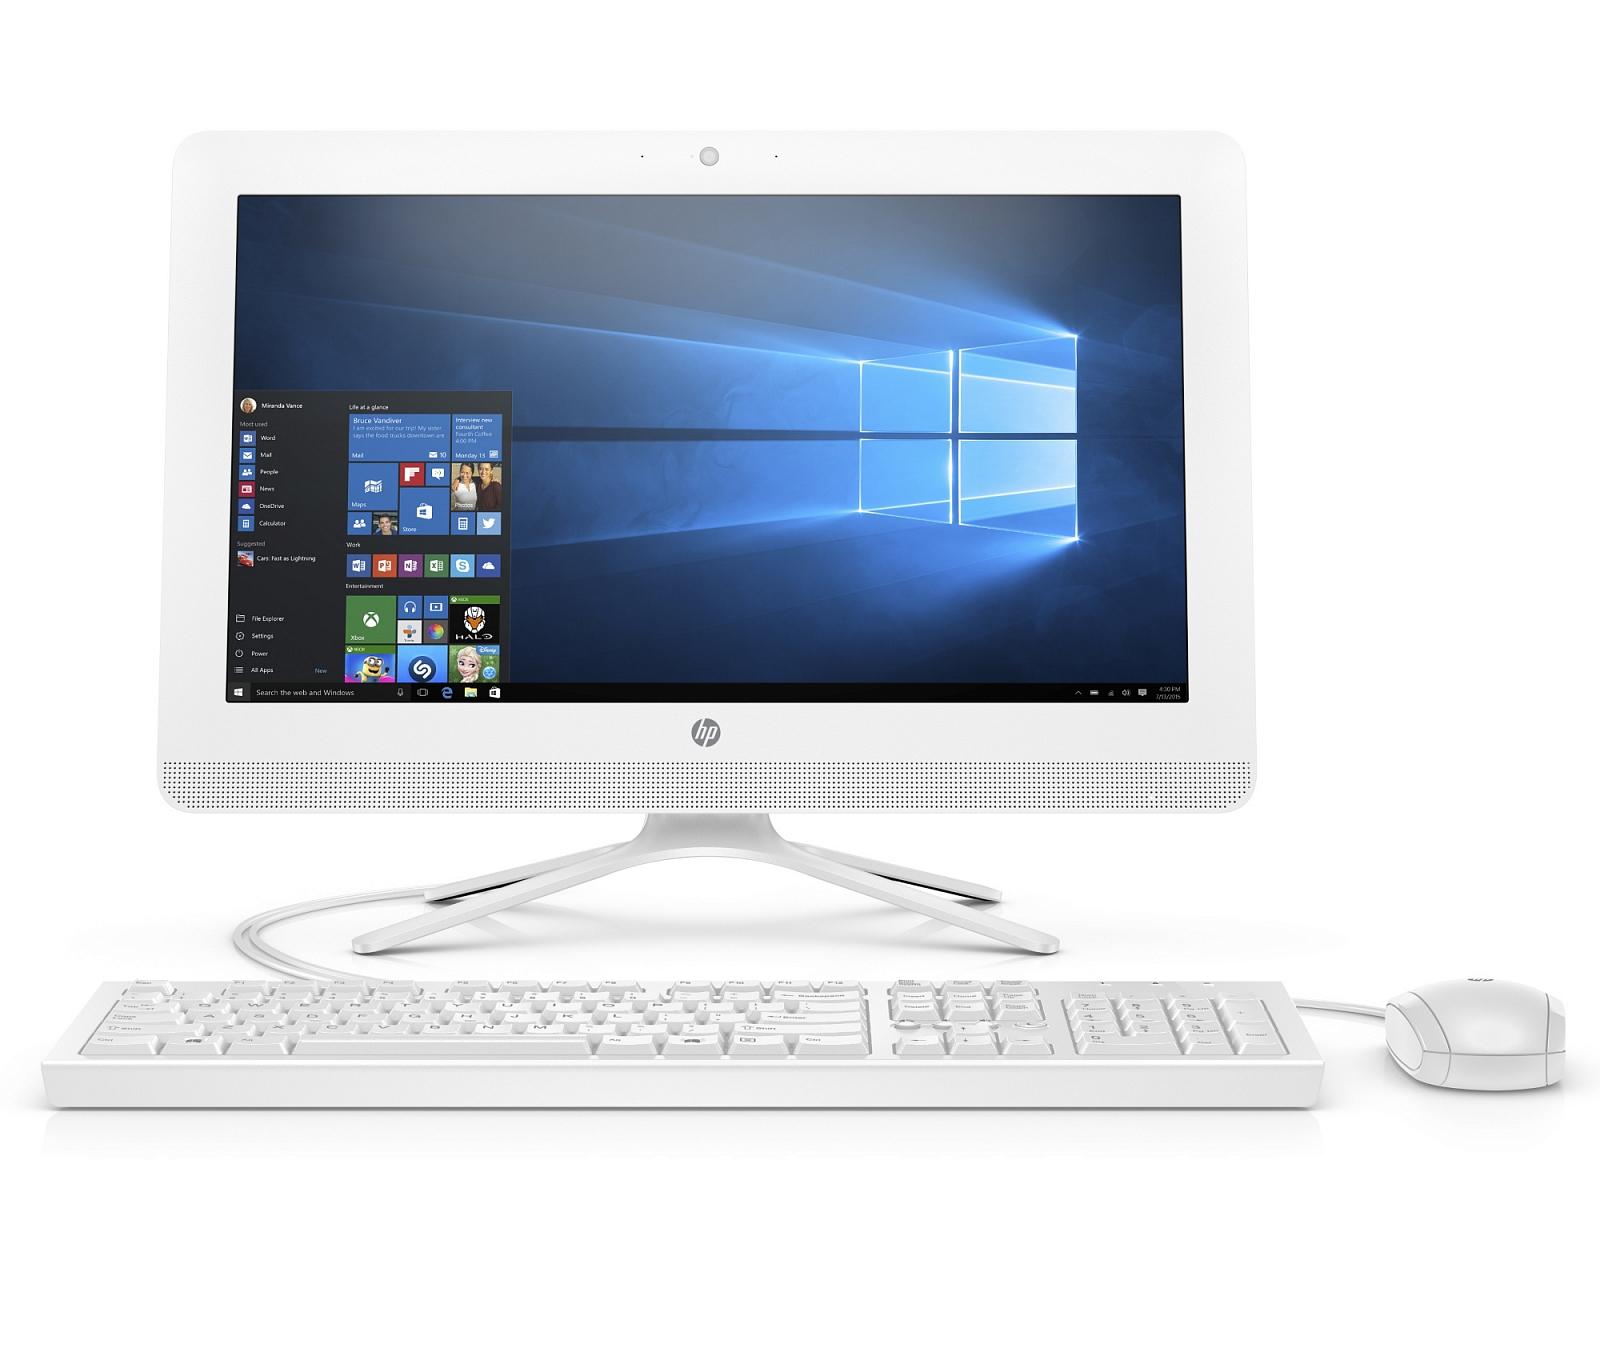 "Моноблок HP All-in-One 21-b0022ur 20.7"" 1920x1080, Intel Core i5-1035G1 1GHz, 8Gb RAM, 1Tb HDD, 512Gb SSD, Intel UHD Graphics, WiFi, BT, Cam, W10, белый, клавиатура, мышь (2S7N7EA)"